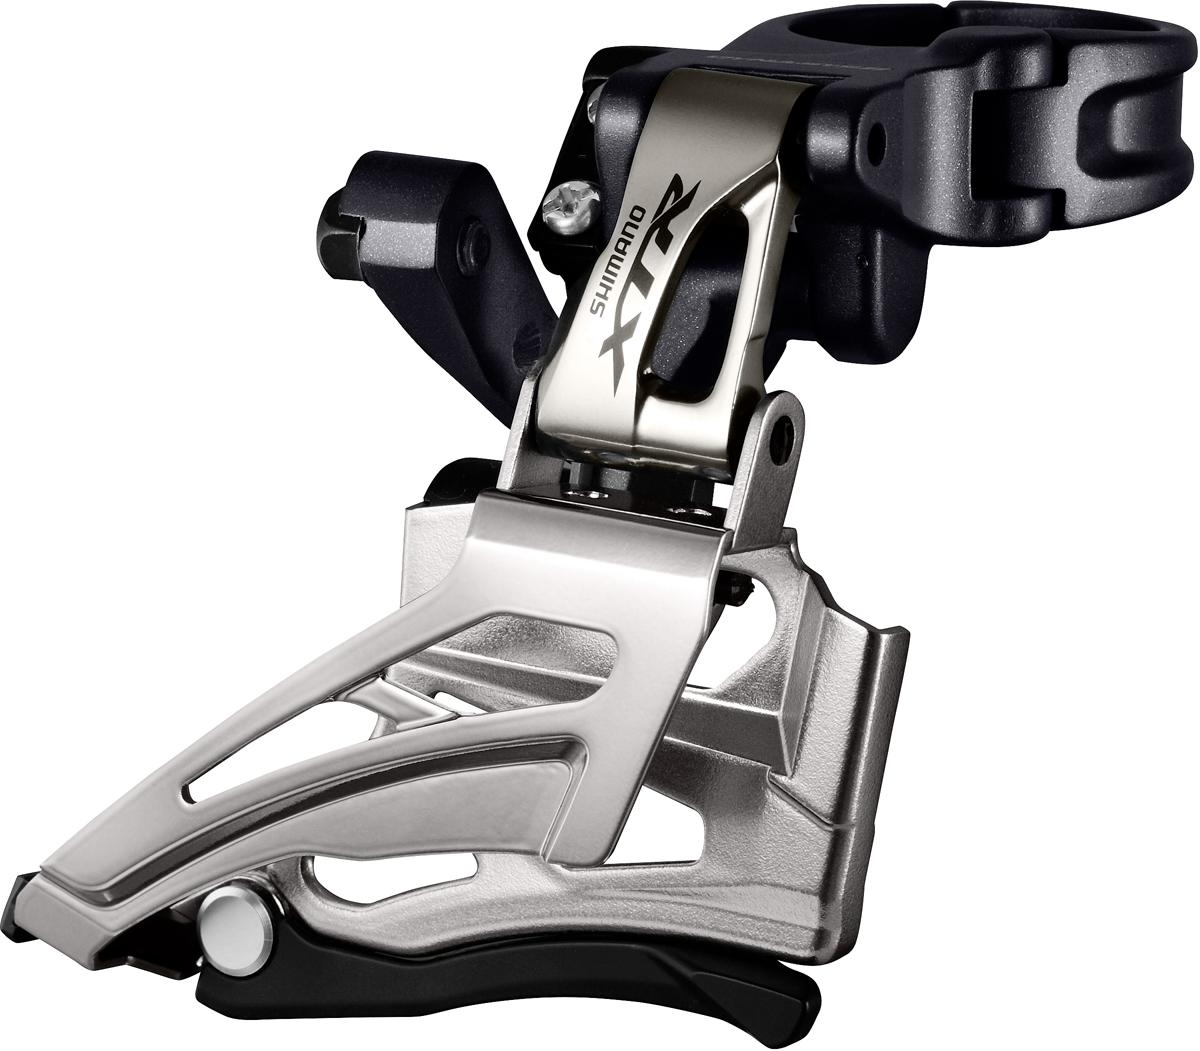 SHIMANO přesmykač XTR FD-M9020 MTB pro 2x11 obj. 34,9/31,8 + 28,6 Down-swing dual pull 34/38 z